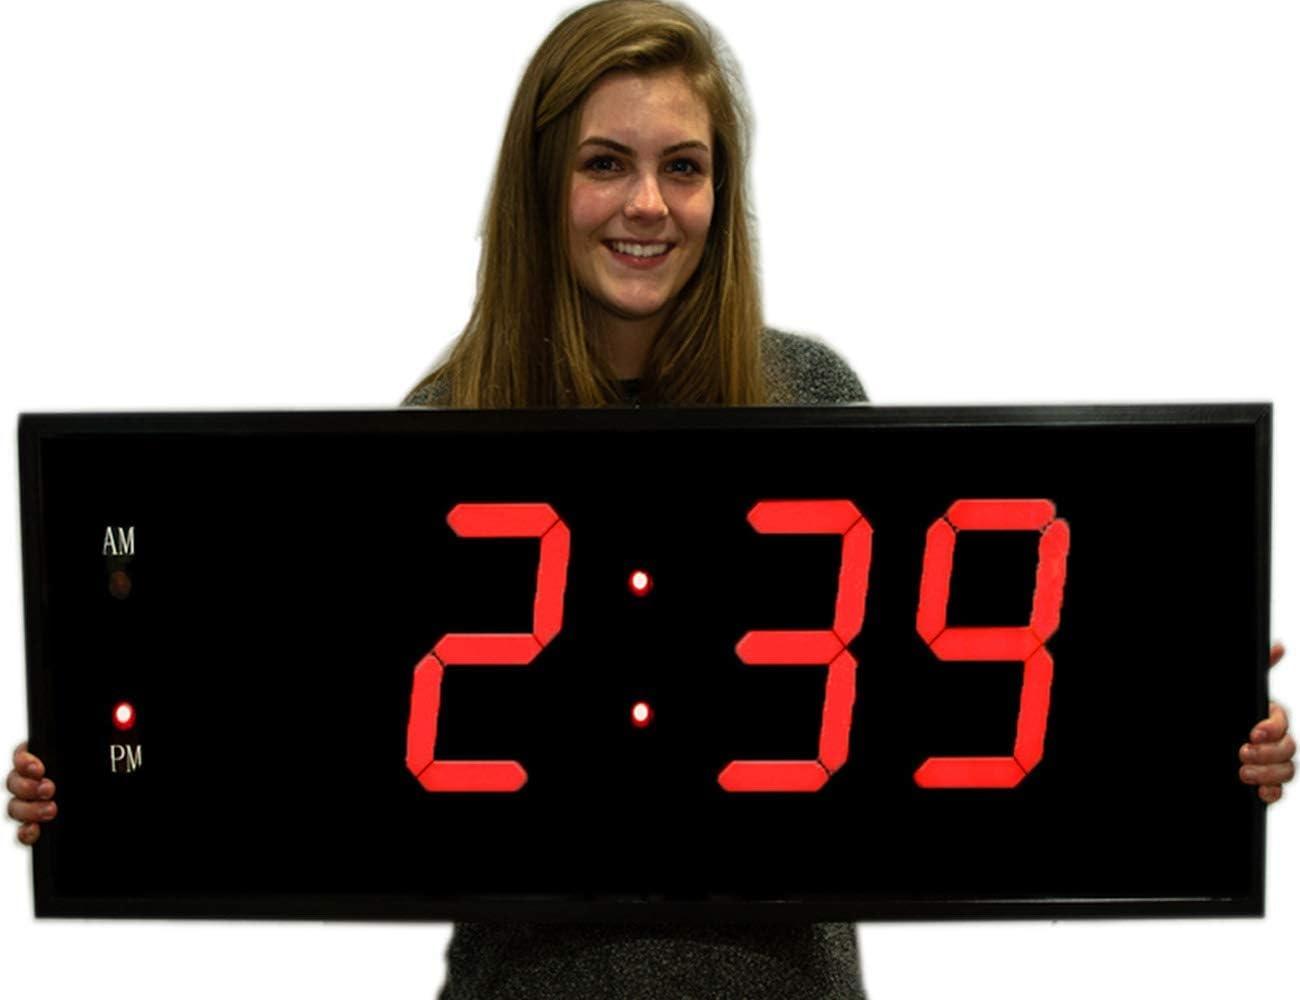 Big Time Clocks - Reloj digital de pared LED con mando a distancia: Amazon.es: Hogar